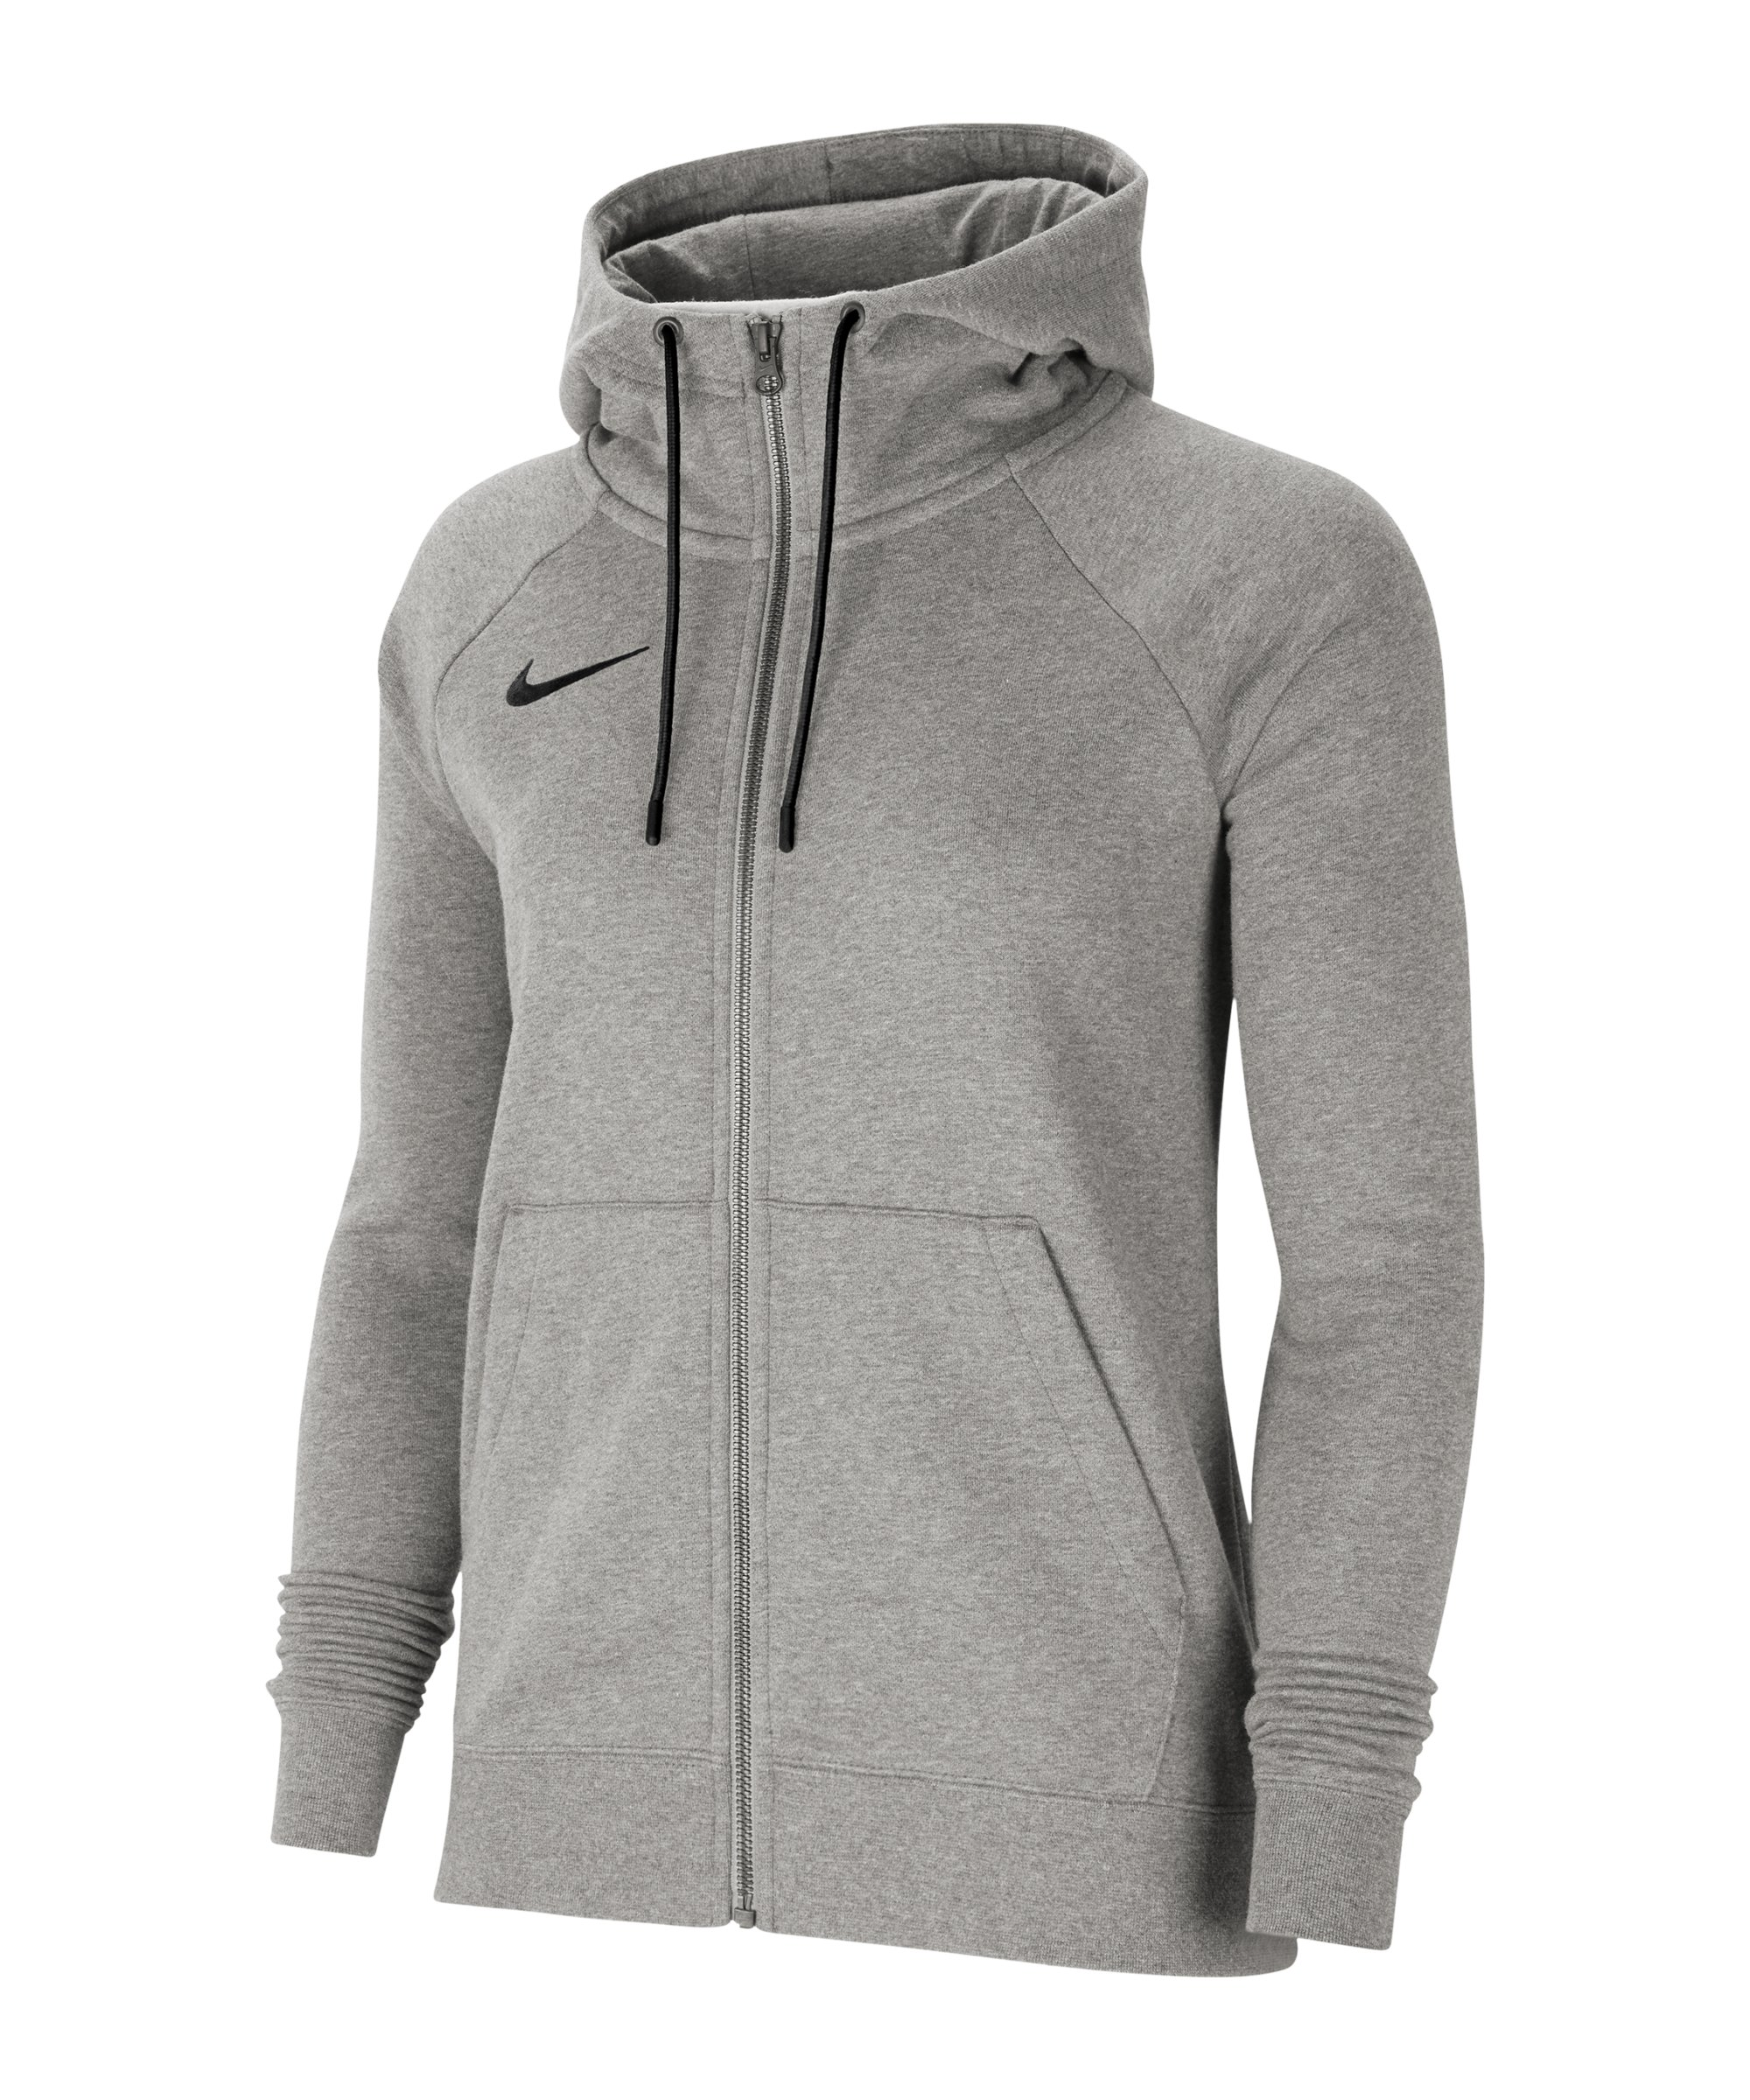 Nike Park 20 Fleece Kapuzenjacke Damen Grau F063 - grau